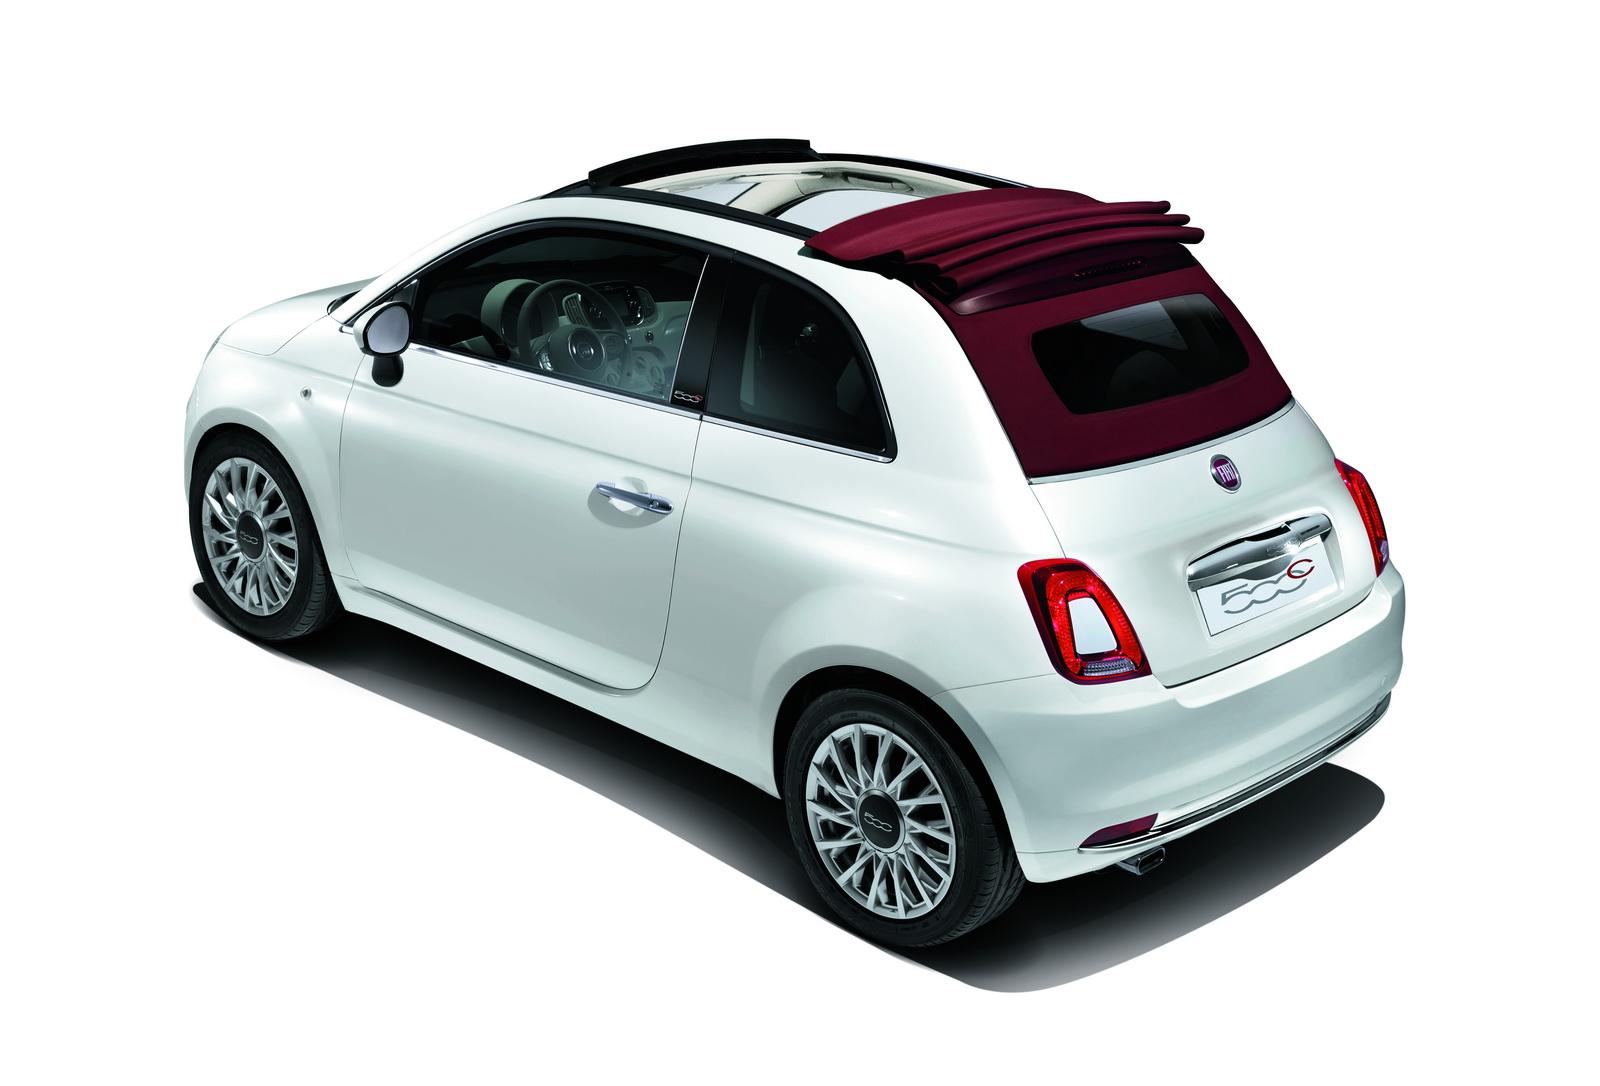 ... Donald Trump Bay St Maarten Plum. on enterprise car rentals lax